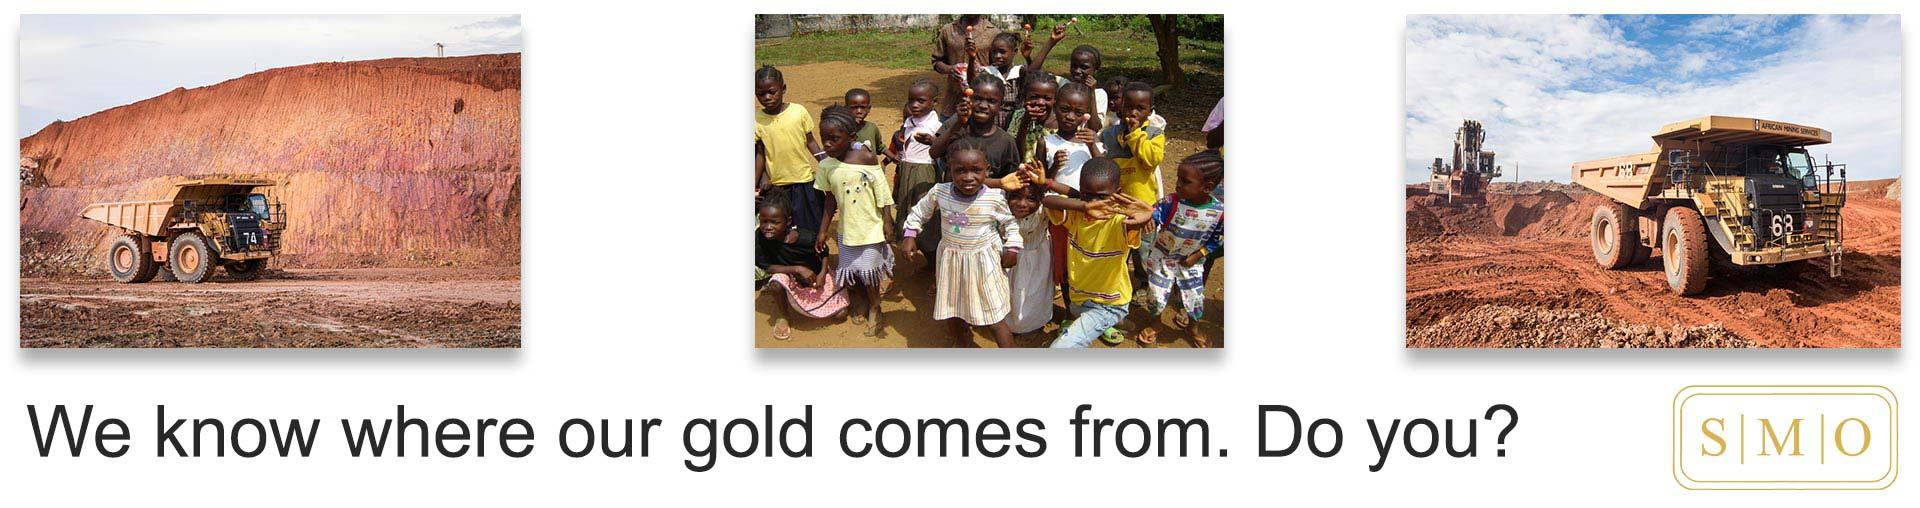 single mine origin gold